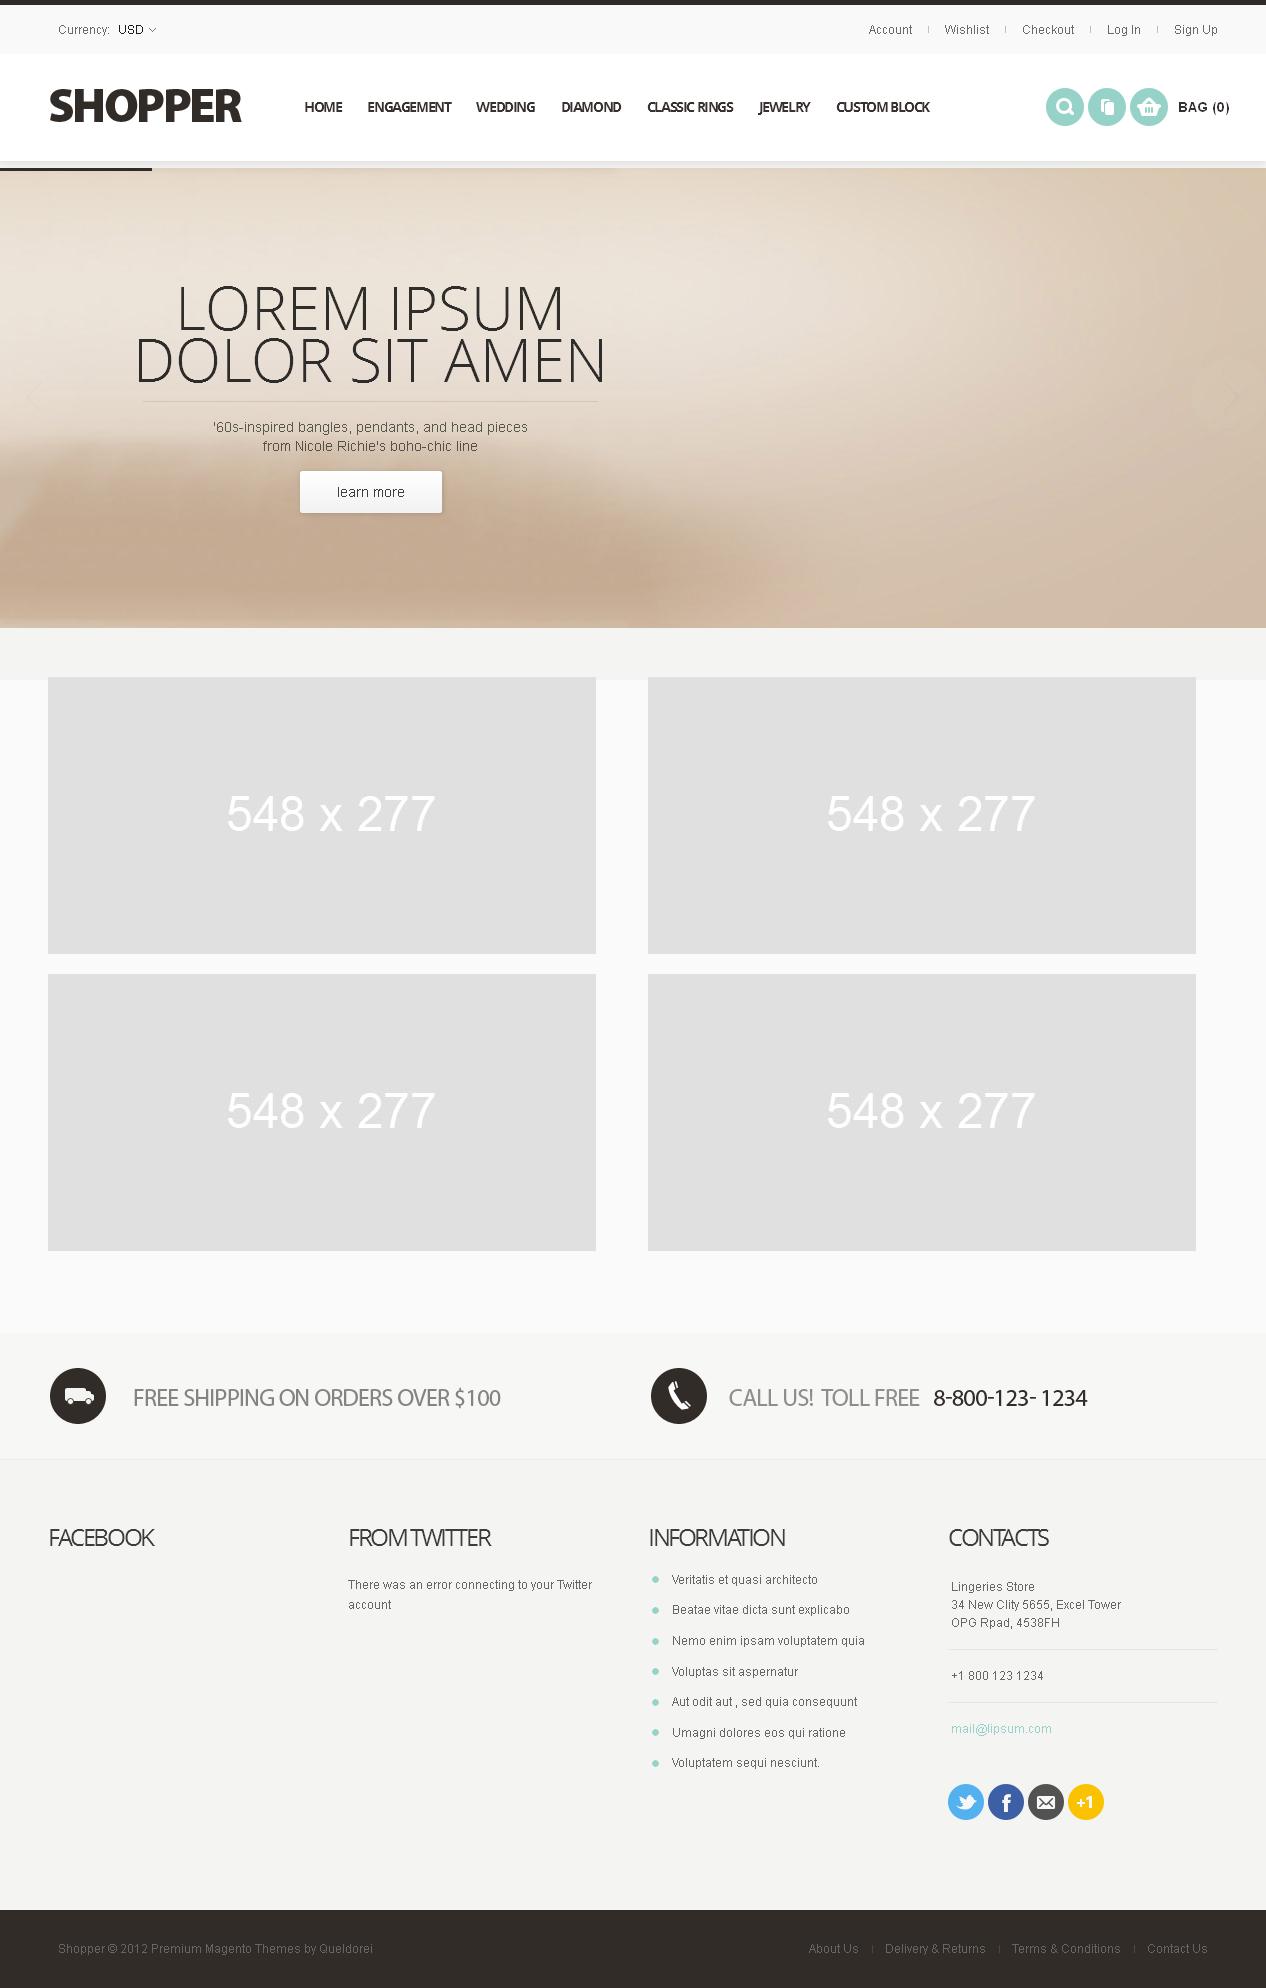 Magento Website for 'SHOPPER' – Multi-Store Ecommerce Platform